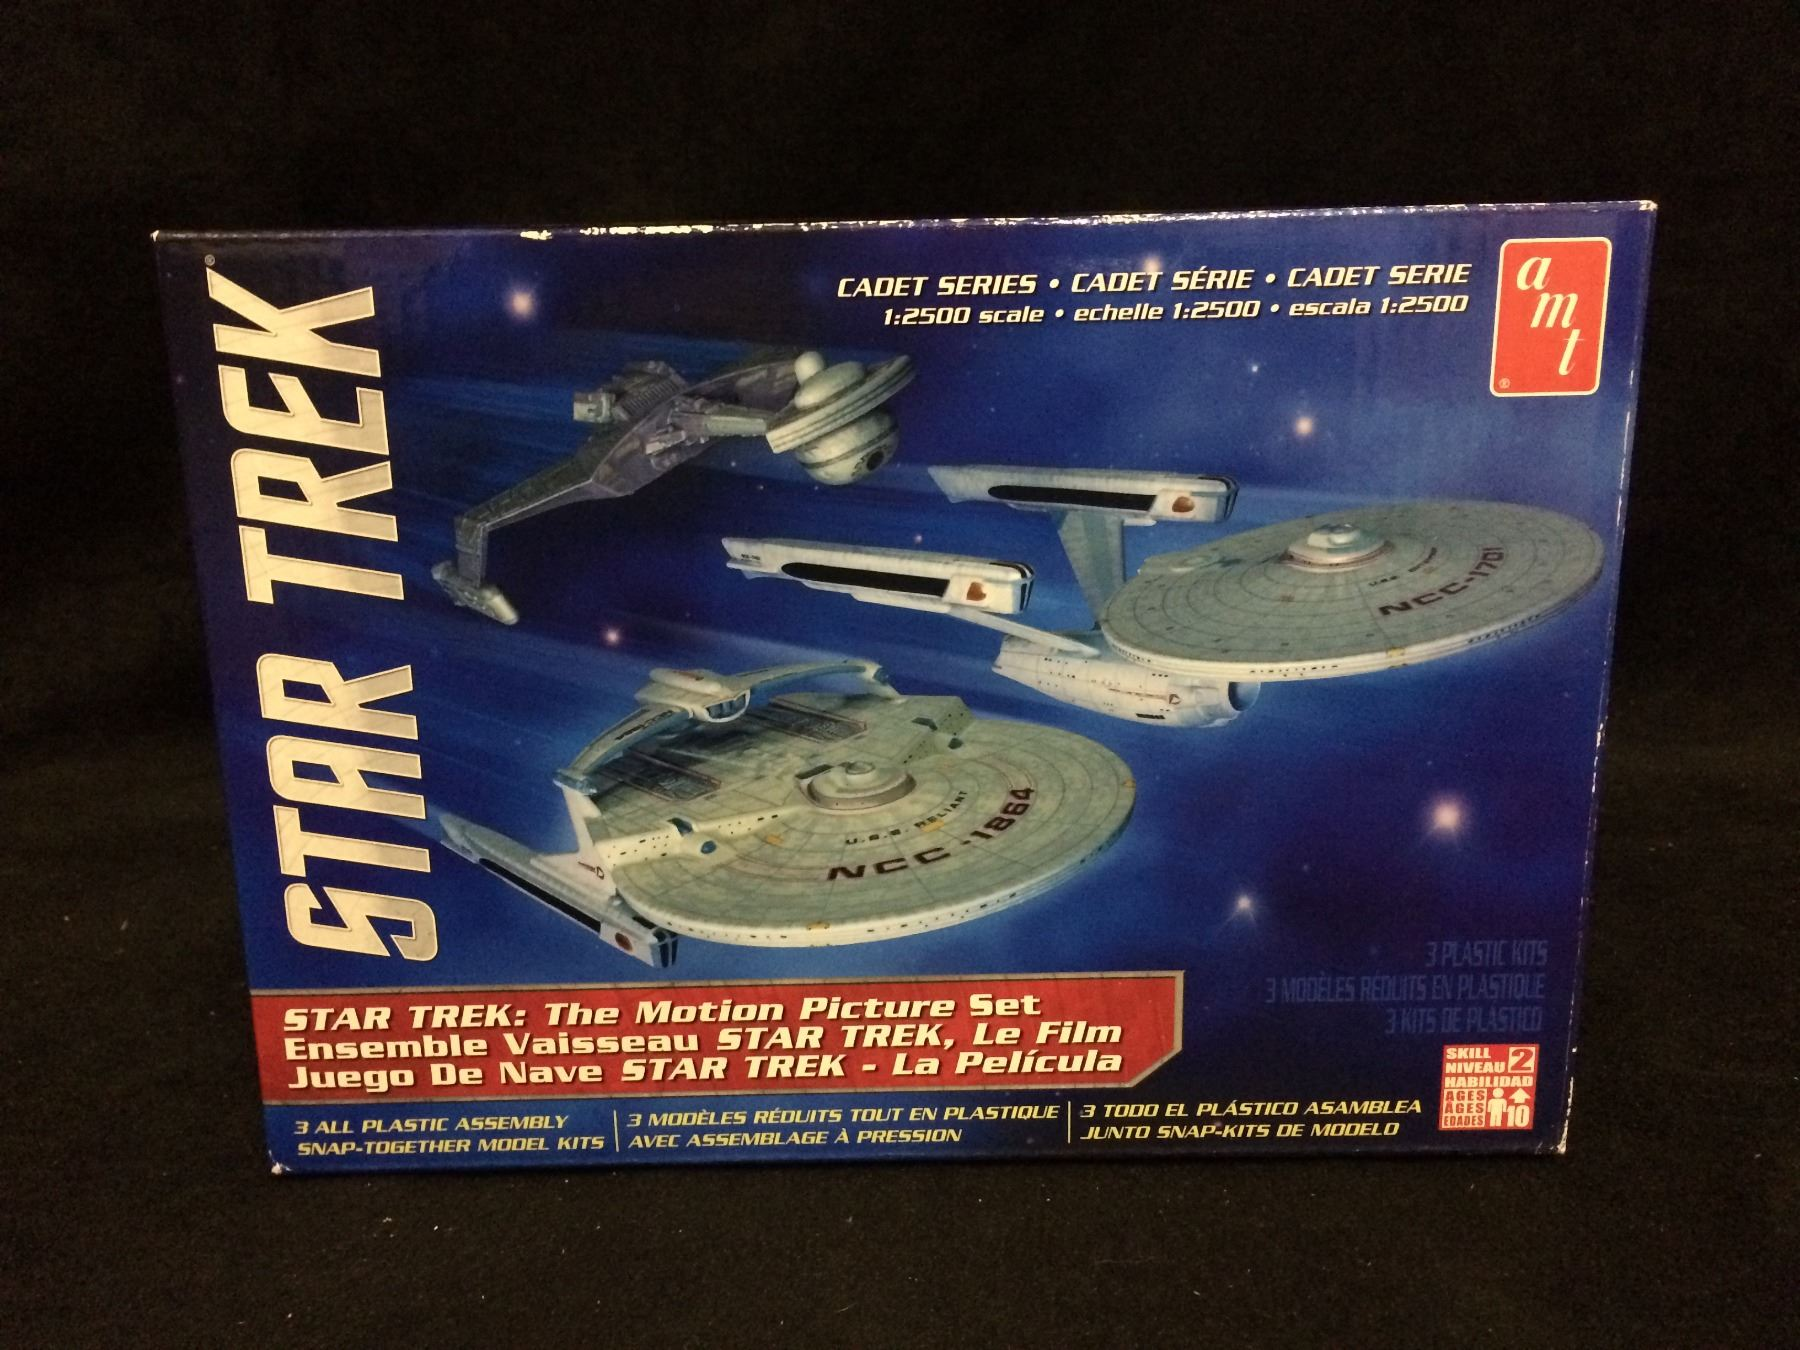 Star Trek Cadet Series The Motion Picture 3 models skill 2 AMT